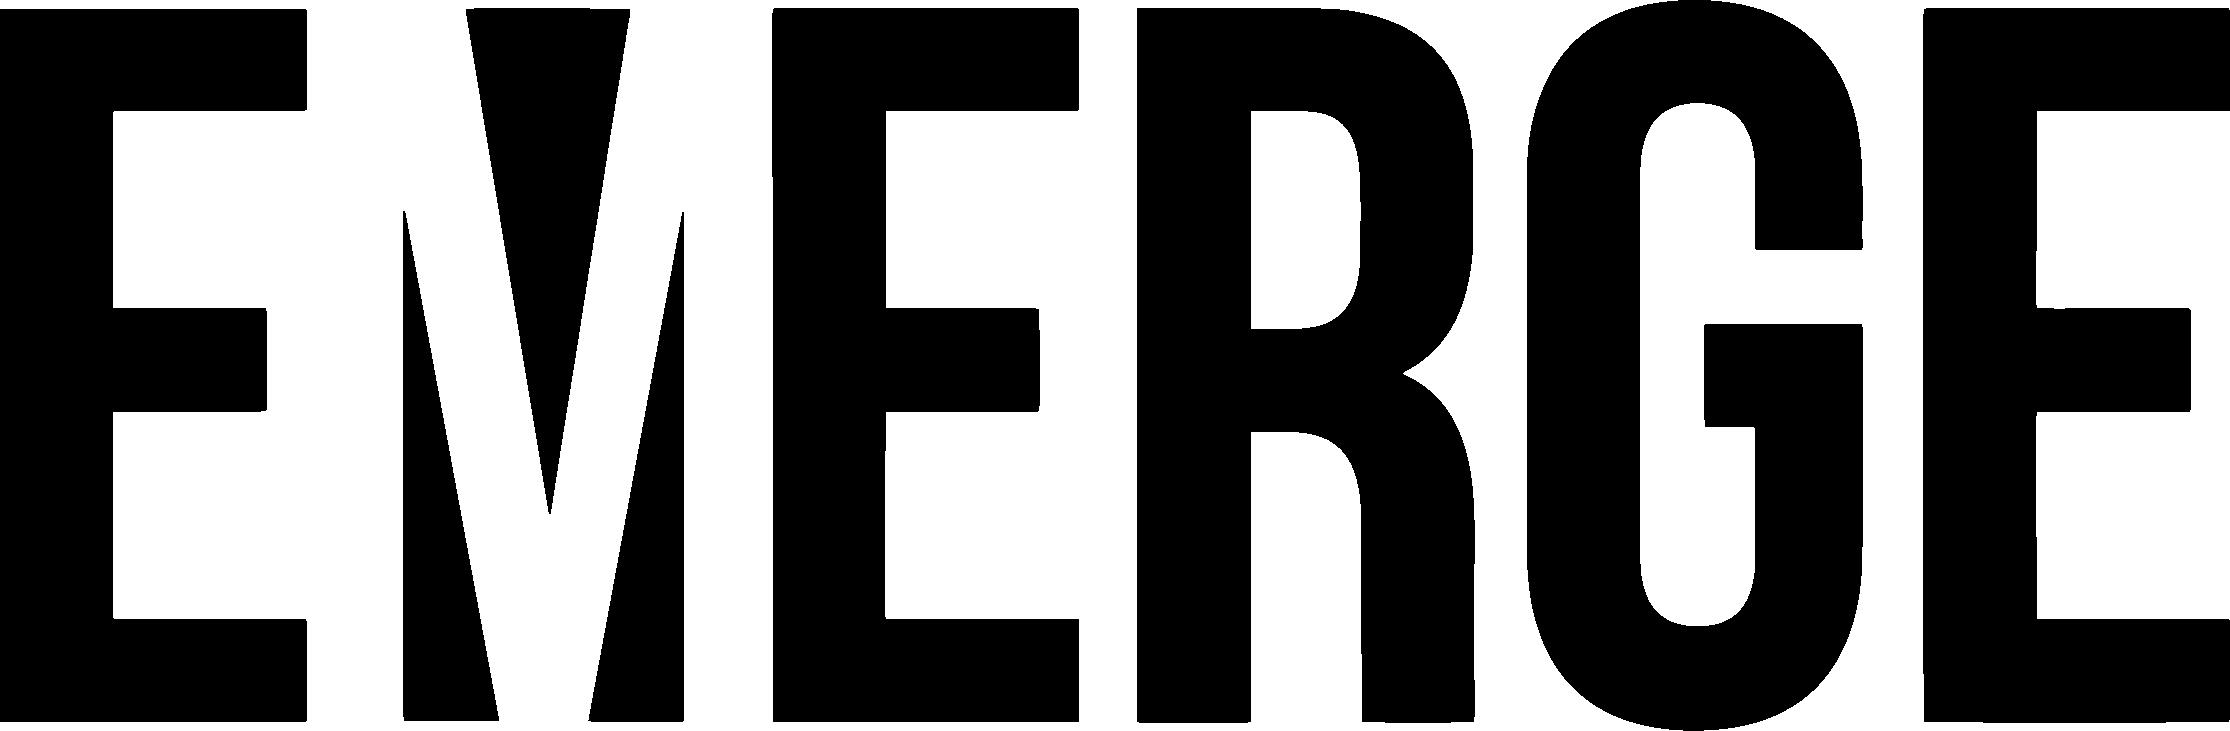 Alternative Emerge logo